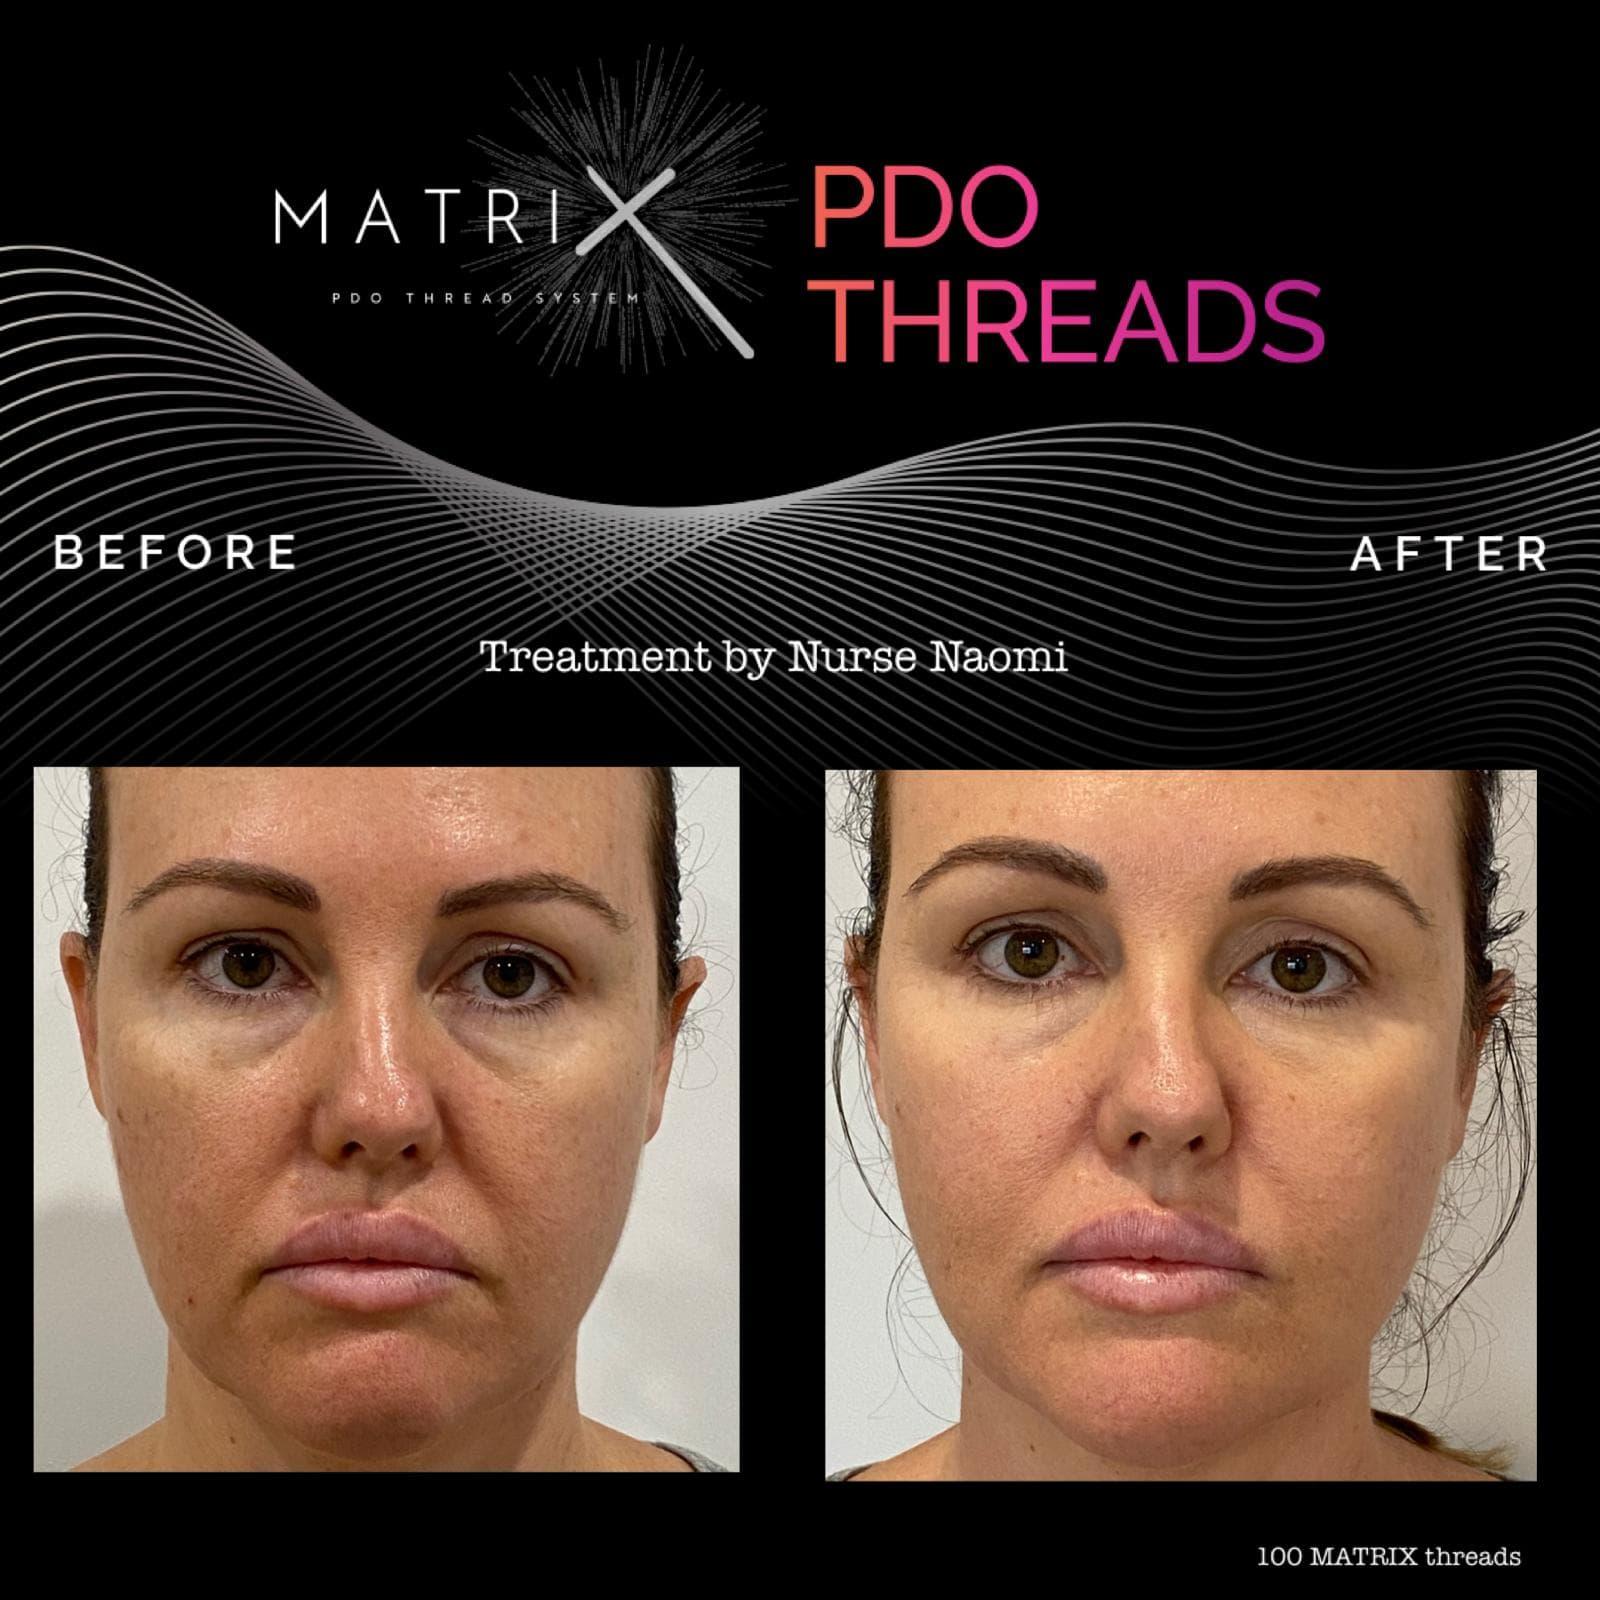 matrix-pdo-before-after-6